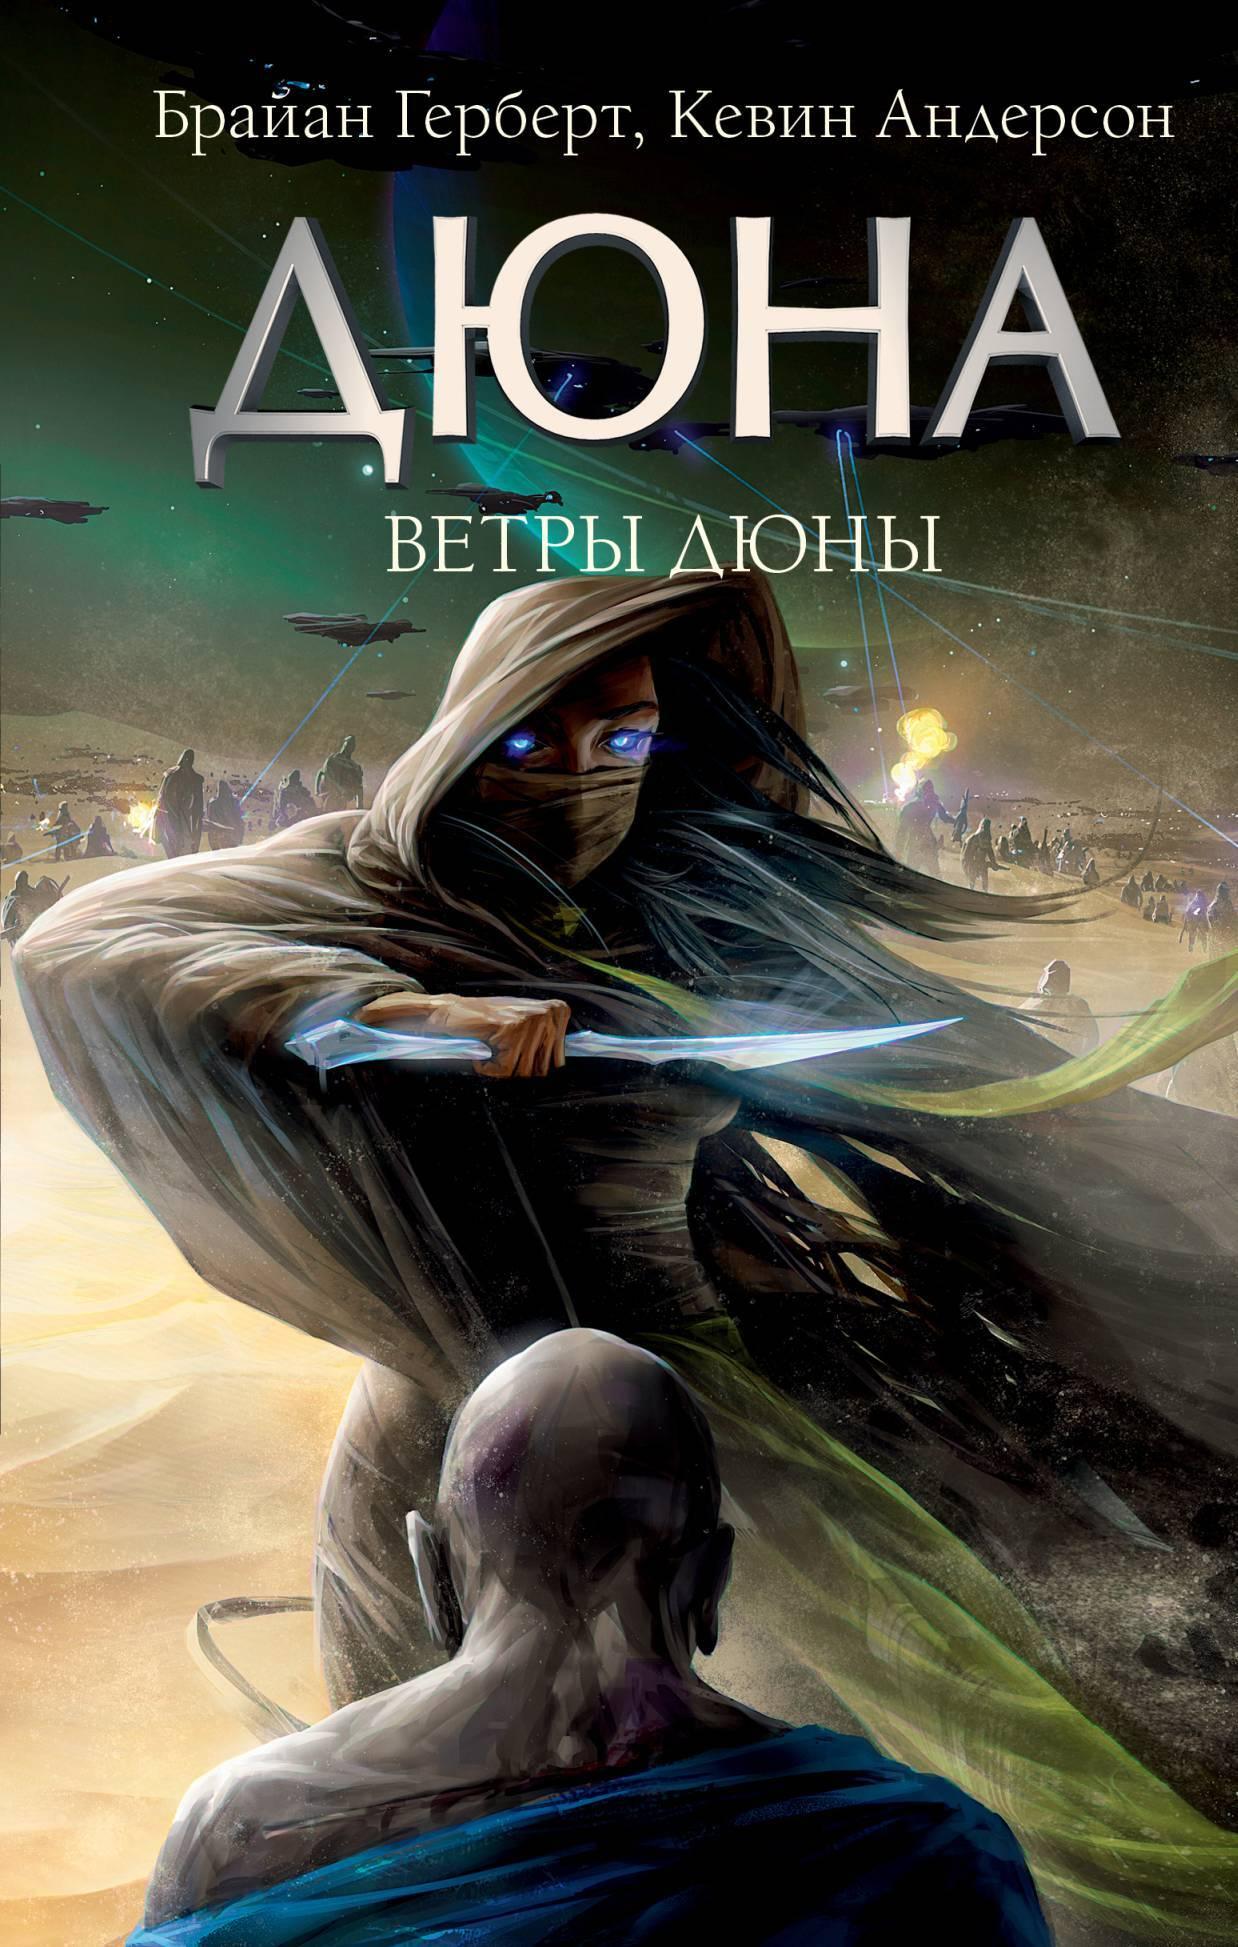 Кевин Андерсон Ветры Дюны герберт ф дюна бог император дюны еретики дюны капитул дюны